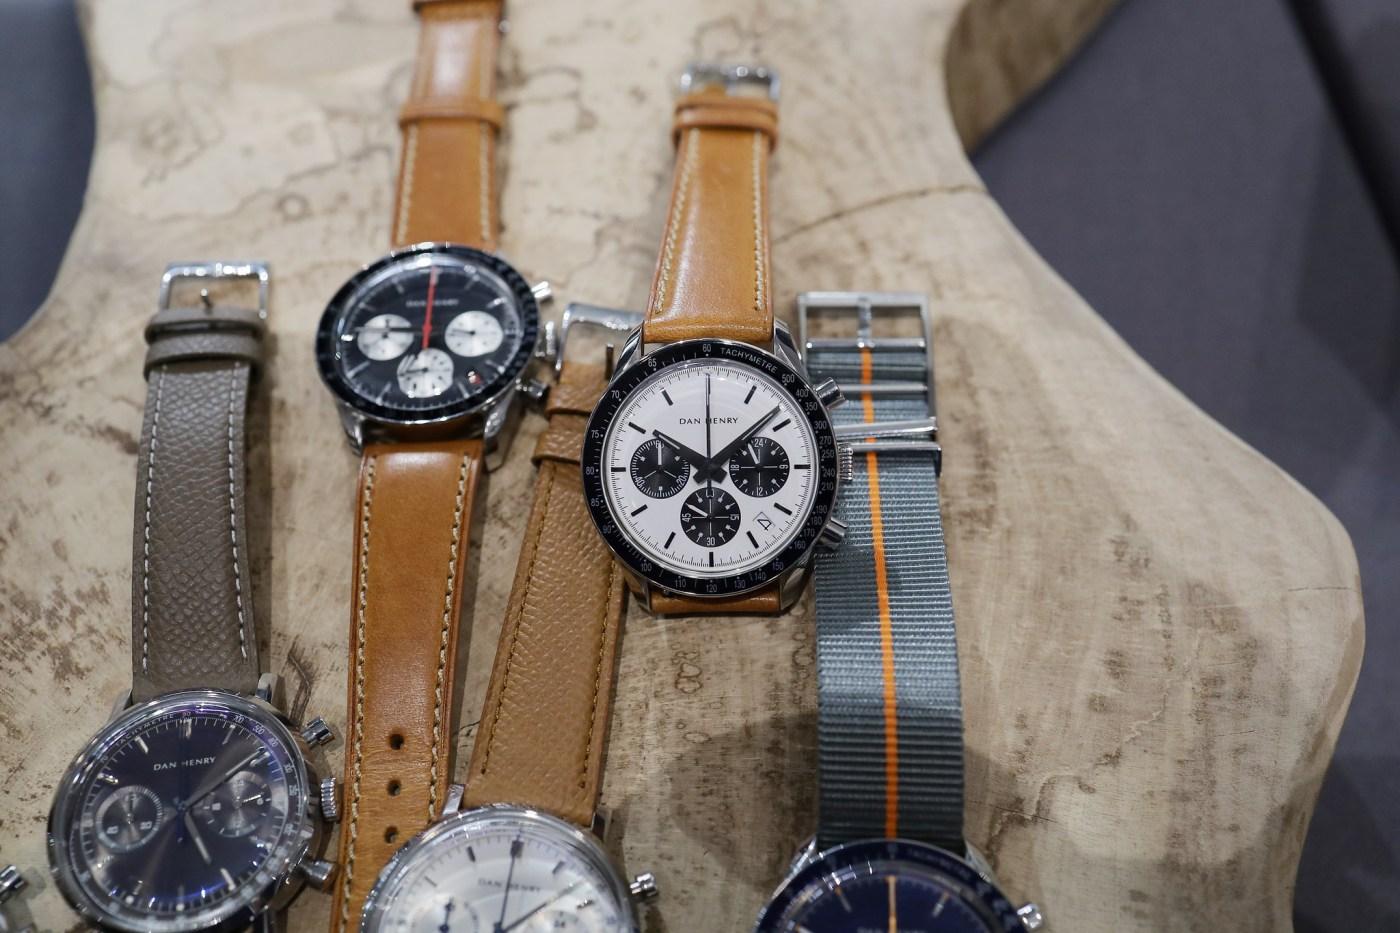 Dan Henry chronographs at Windup